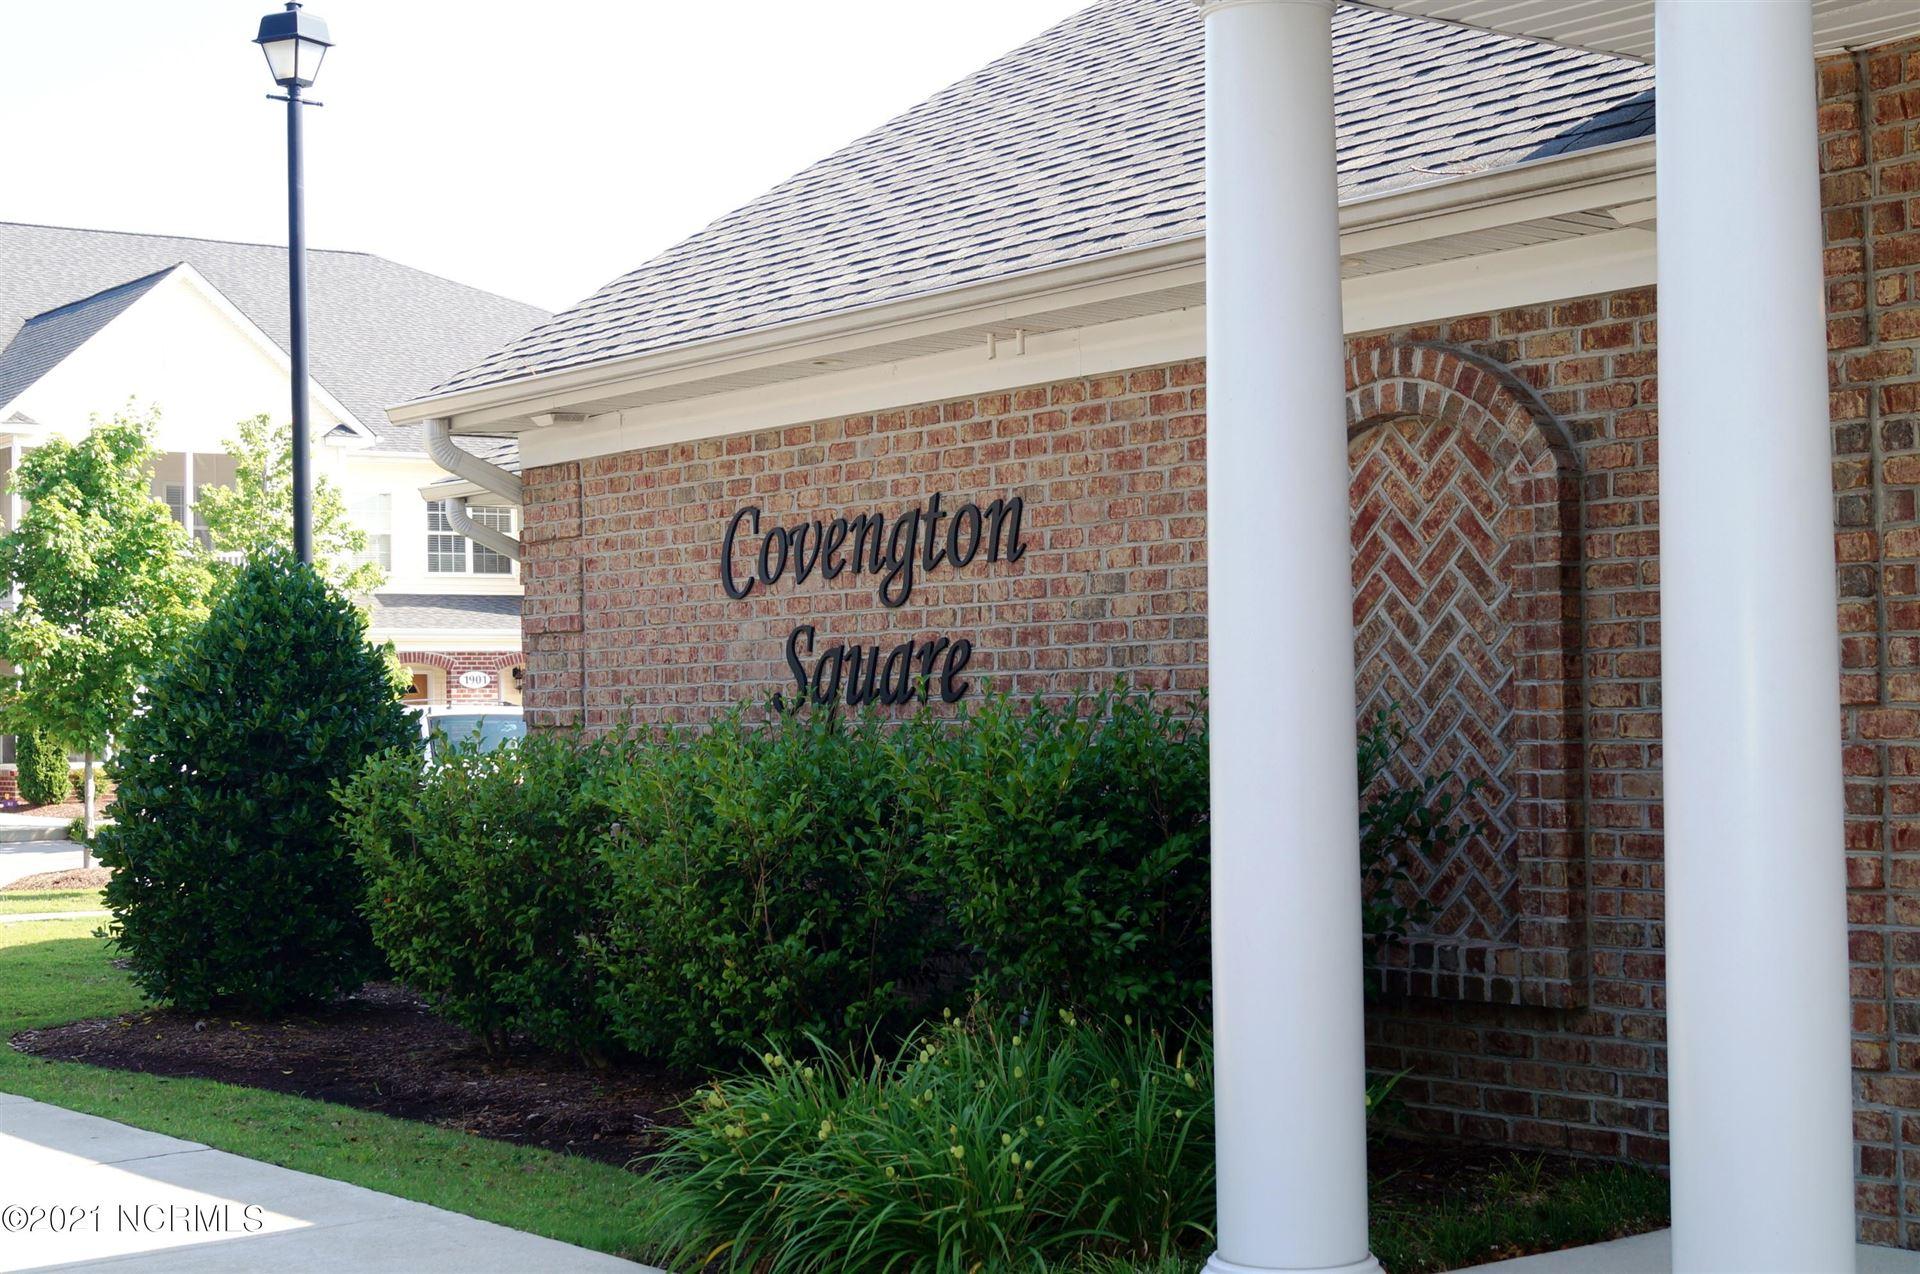 Photo of 1905 Covengton Way #204, Greenville, NC 27858 (MLS # 100284072)